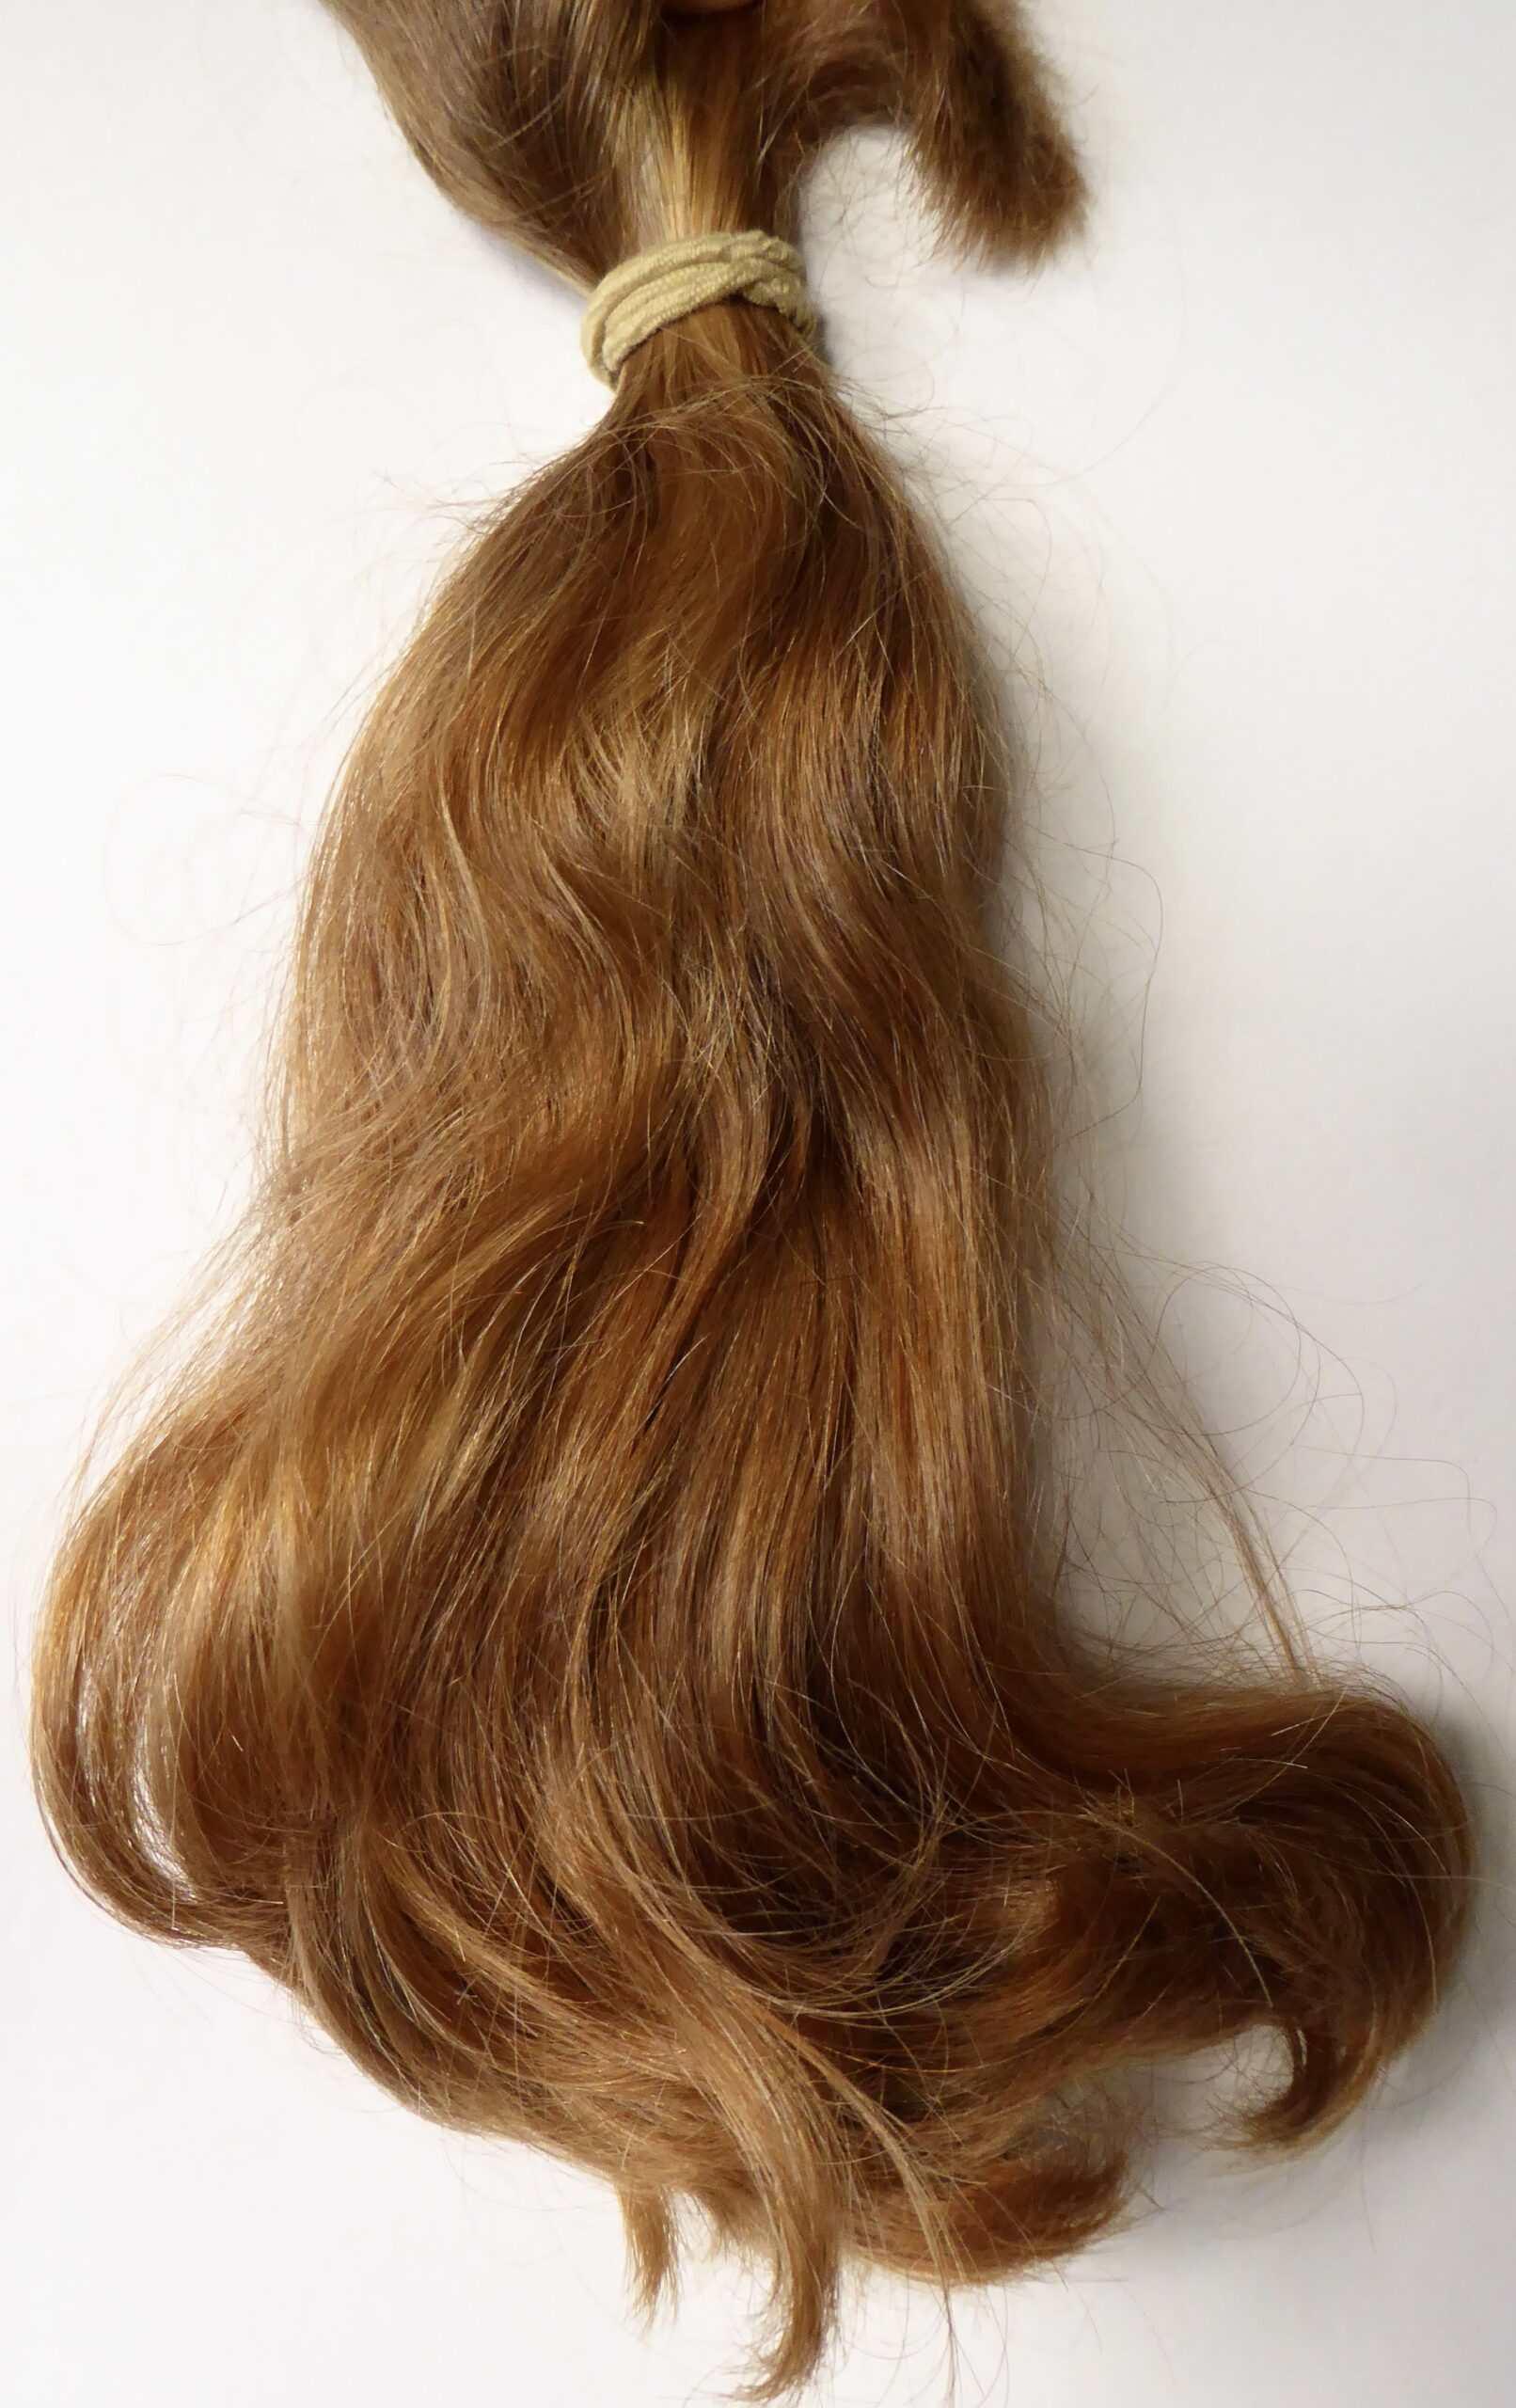 Light red/strawberry blonde virgin hair